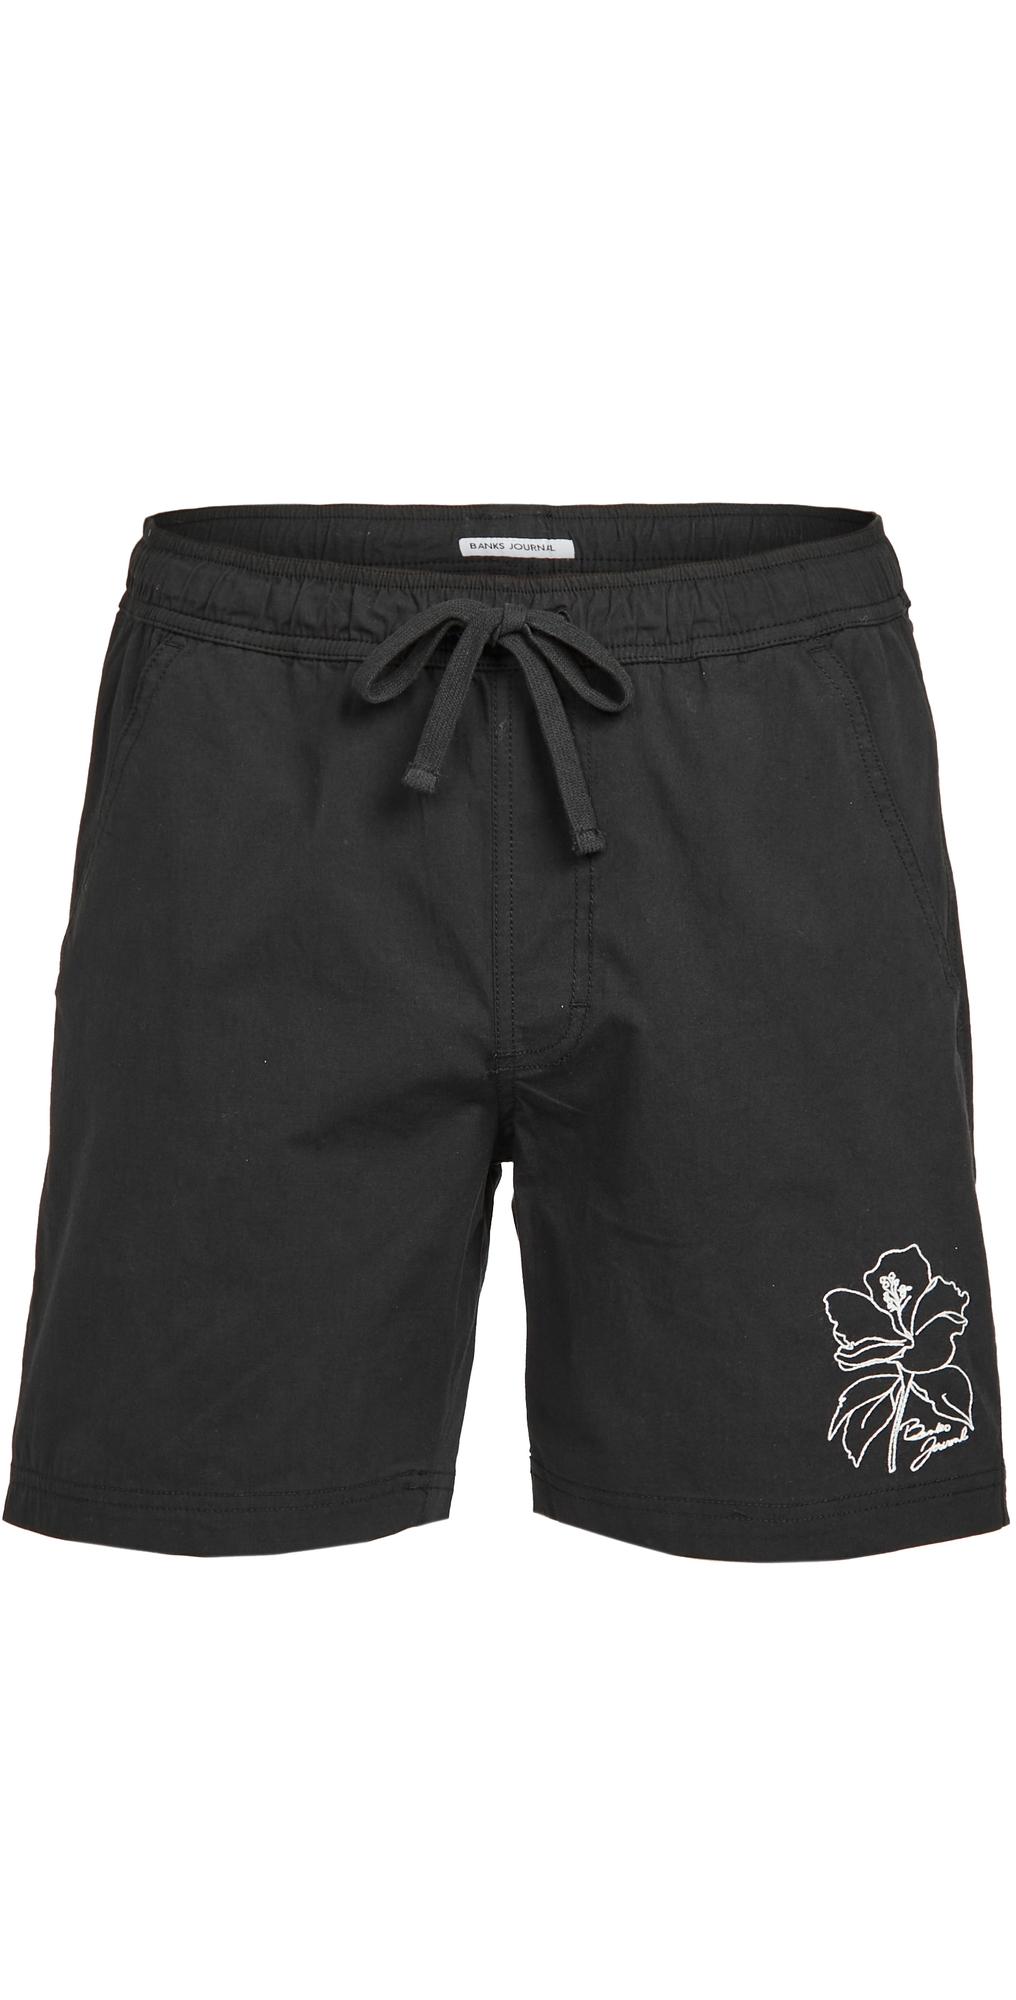 Form Shorts